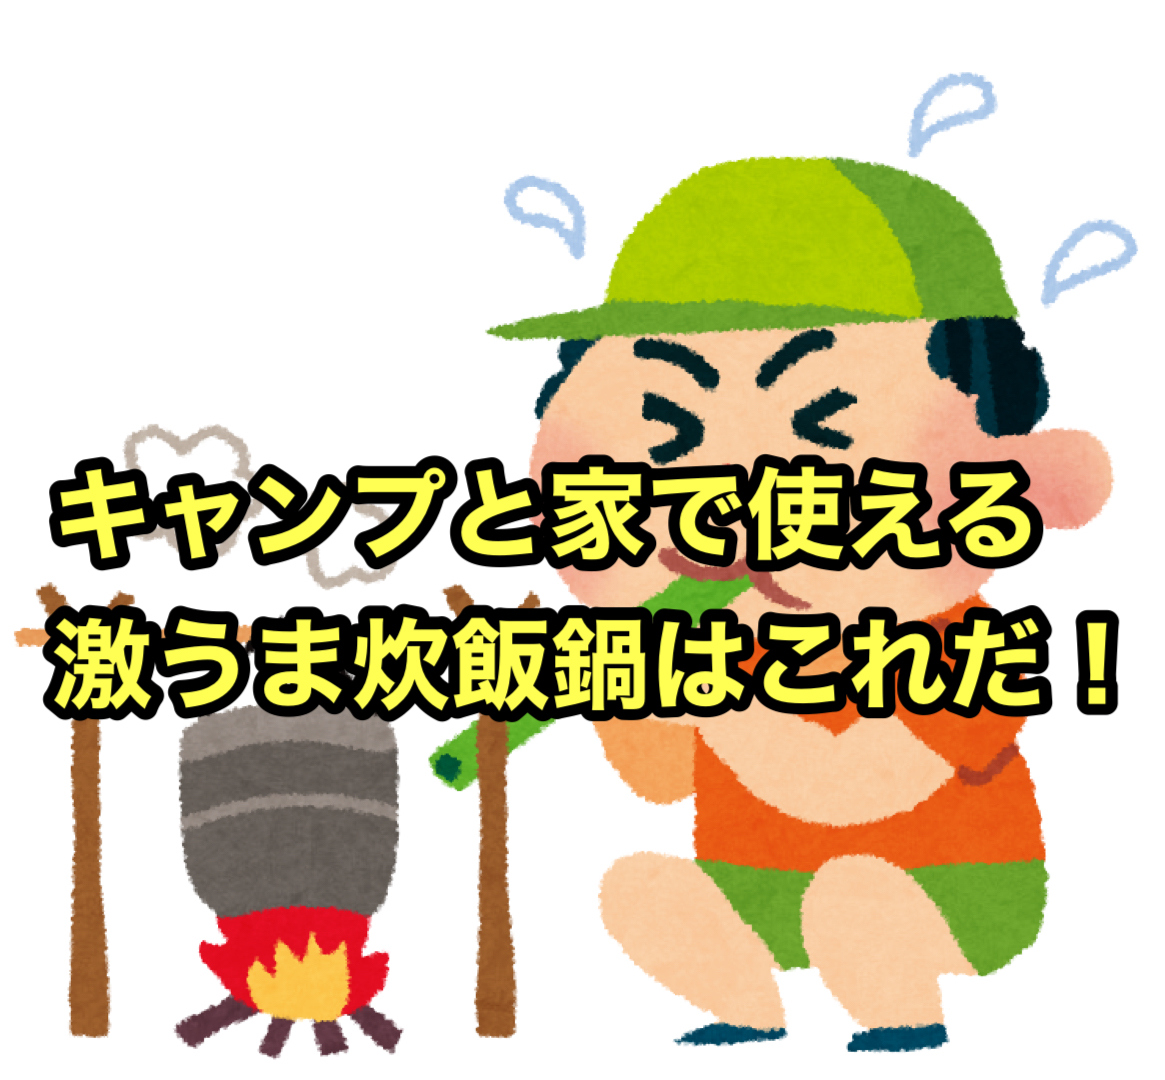 f:id:shoregomoku:20210326152509j:plain